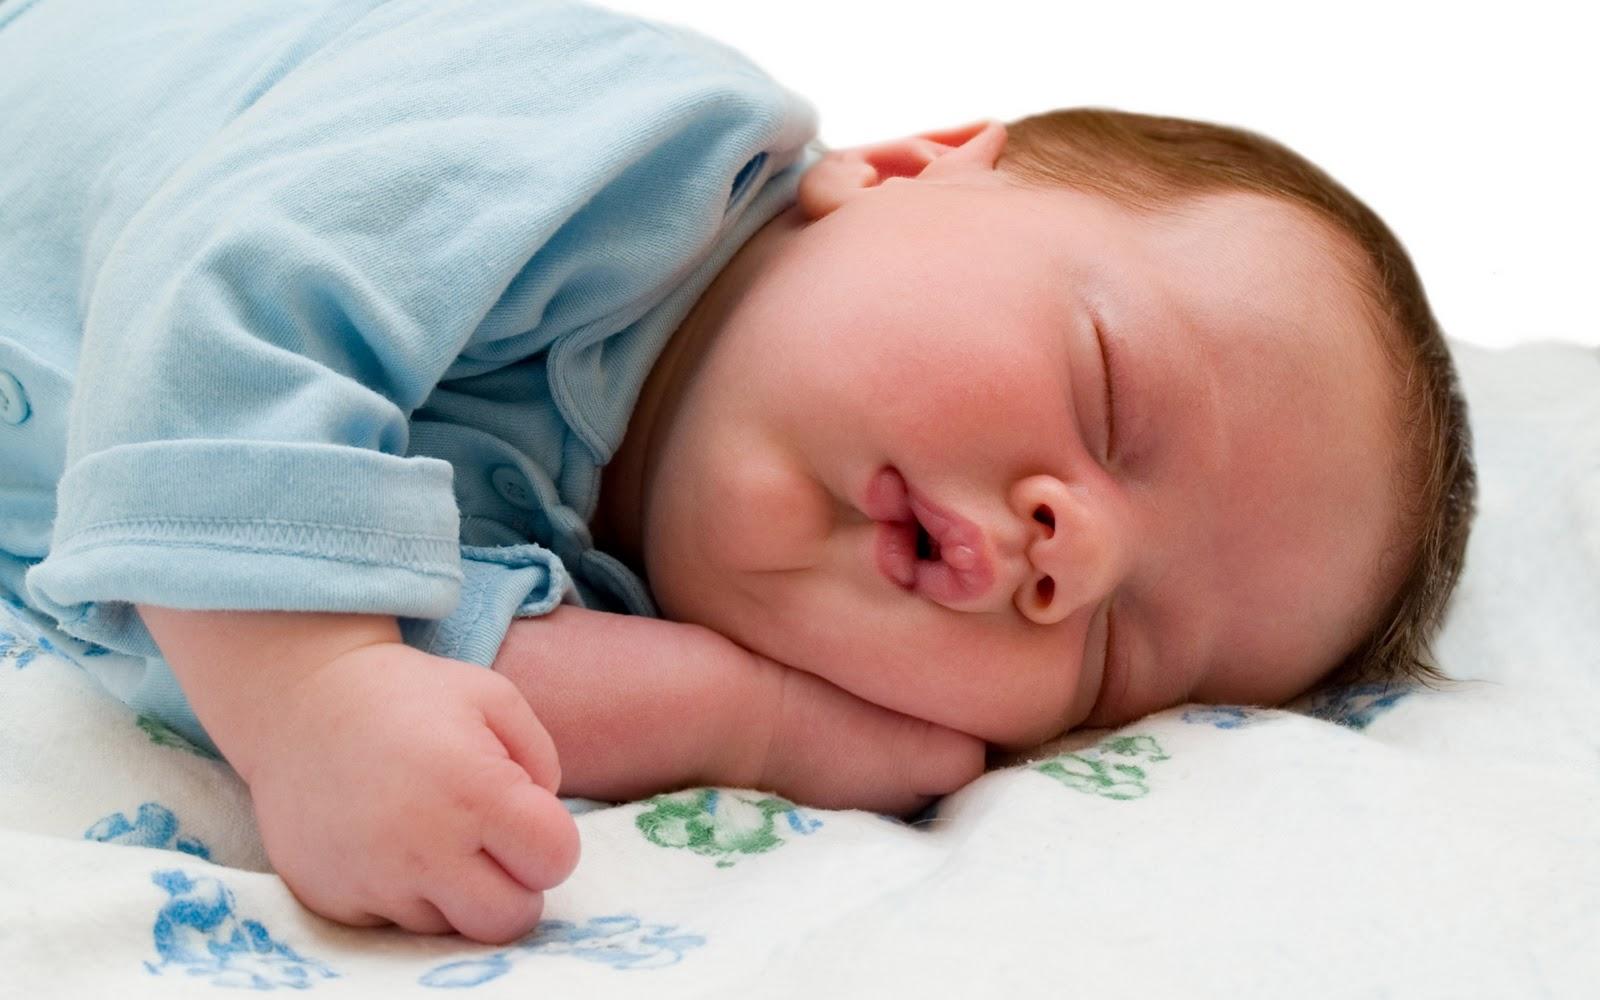 http://2.bp.blogspot.com/-whyqT2roHok/TnWlwh0MJJI/AAAAAAAAB3Q/U9f5Nm0NNRg/s1600/cute-baby-sleeping-picture.jpg